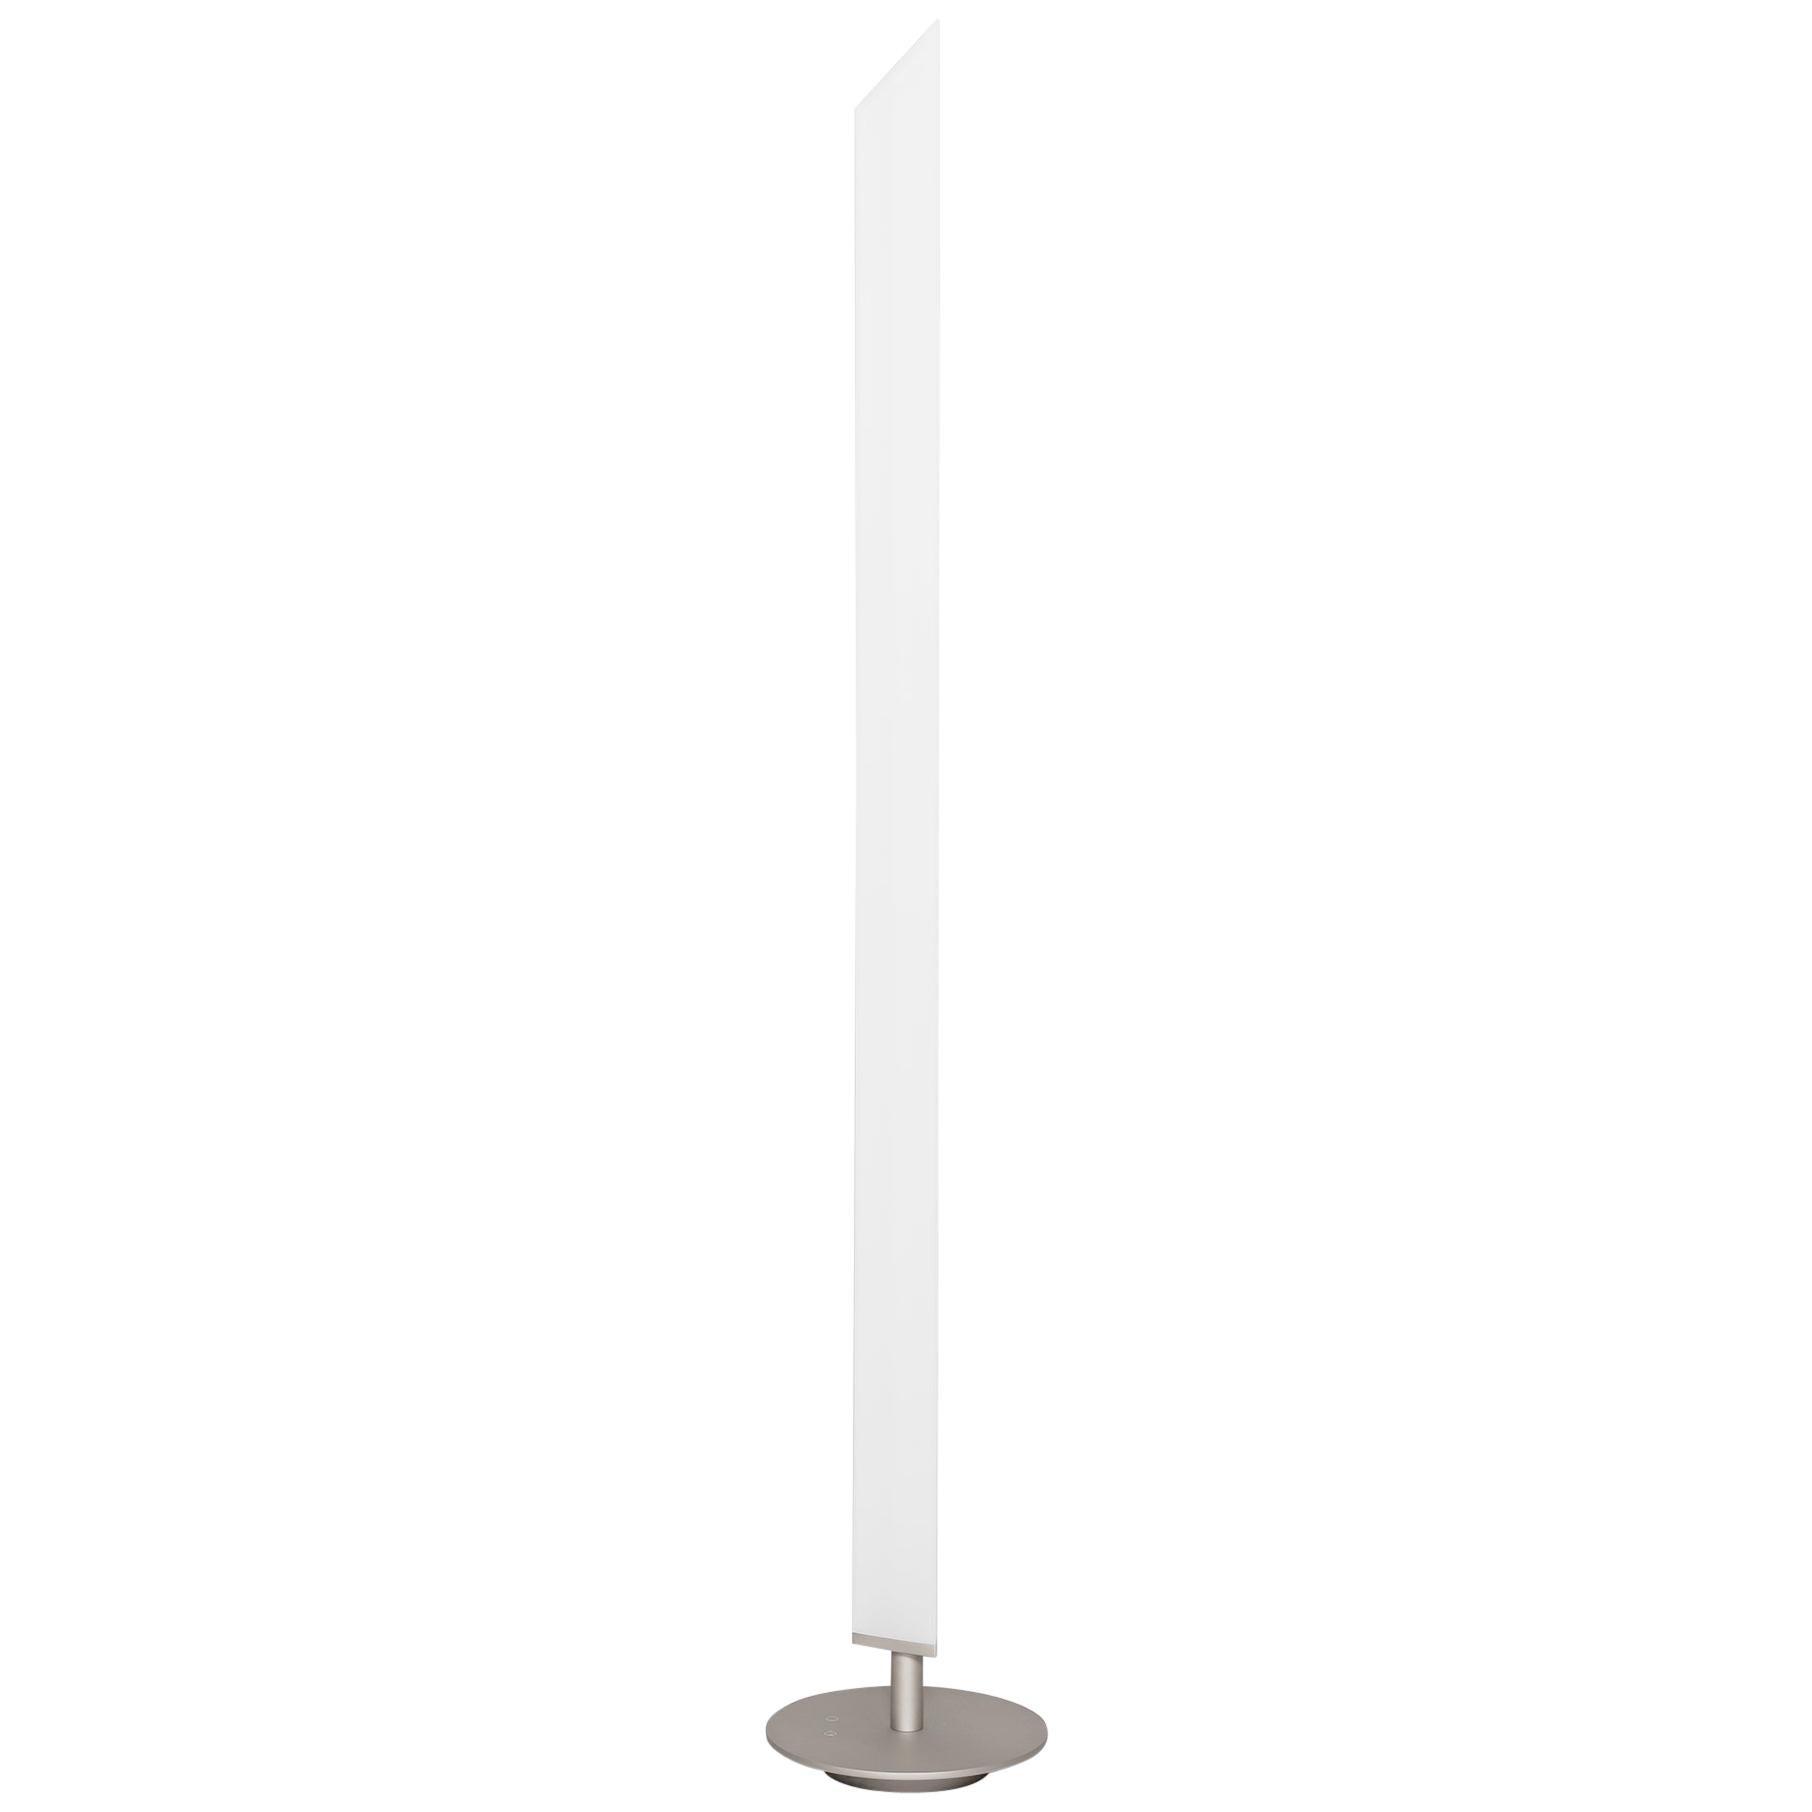 Firmamento Milano White Presbitero Floor Lamp by Pierluigi Cerri